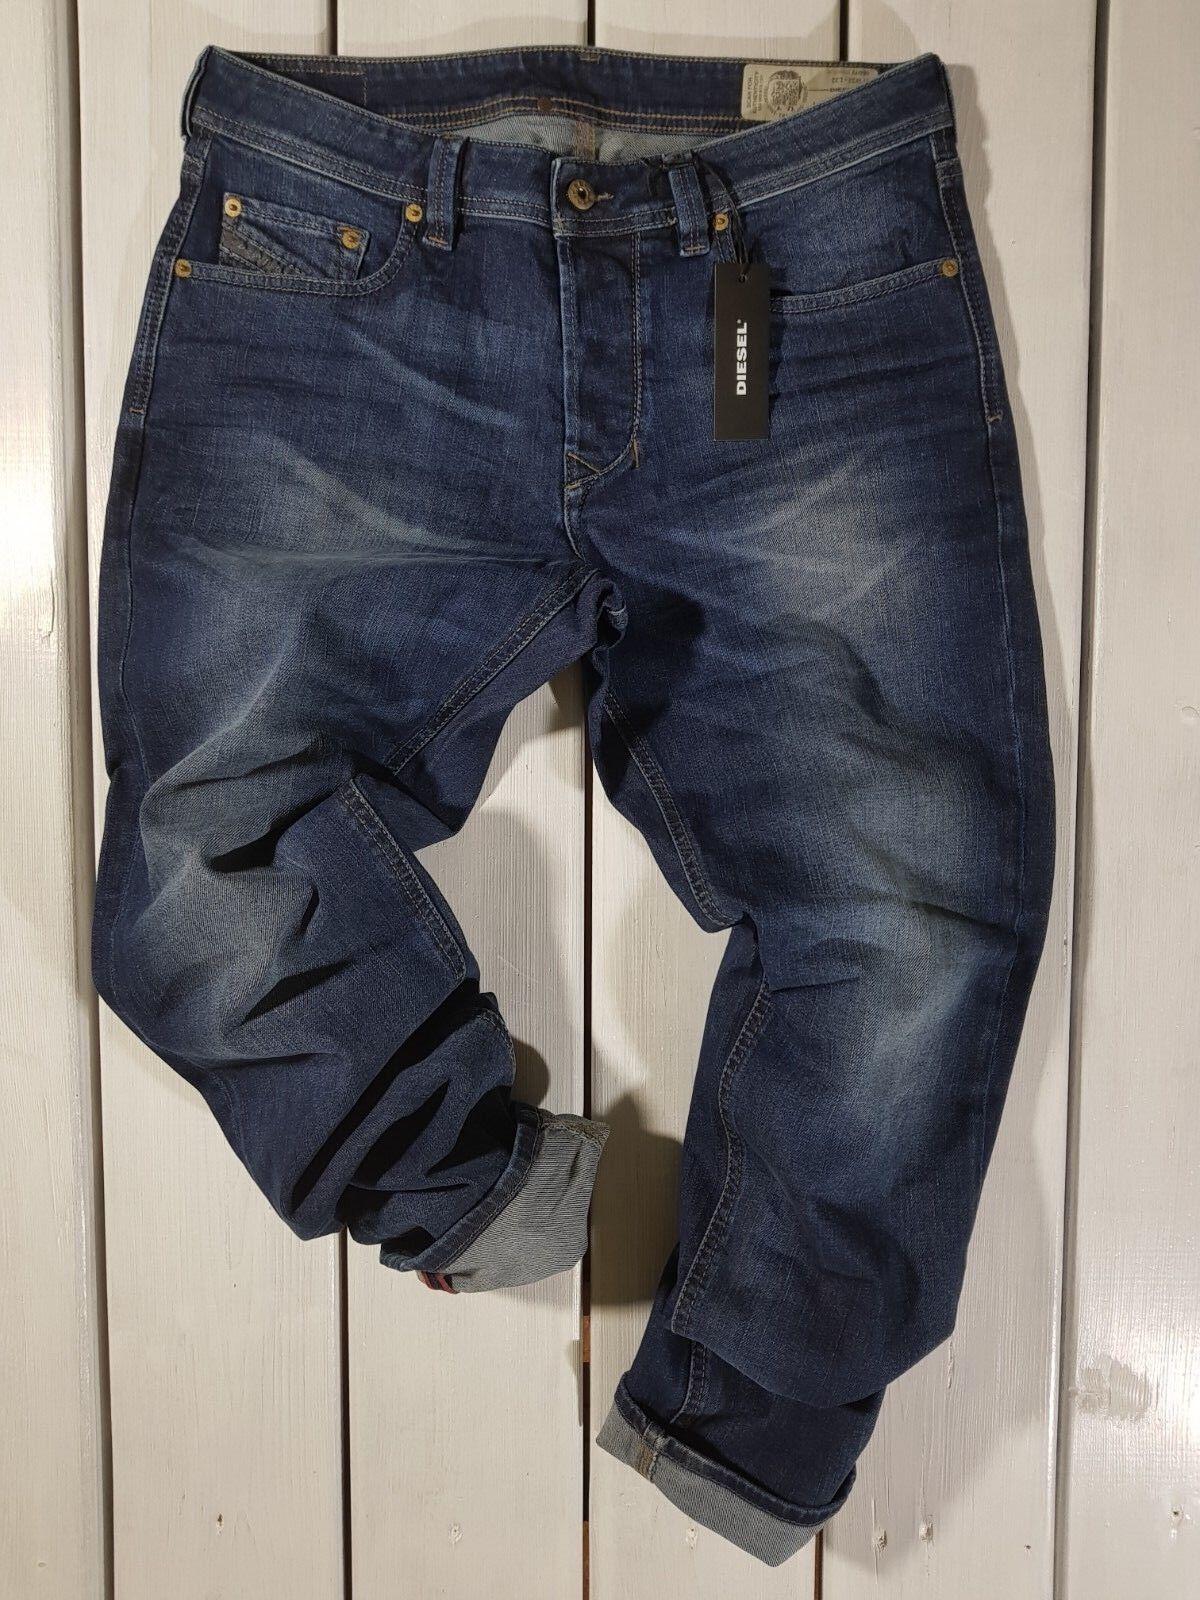 New Diesel Men/'s Jeans Larkee R8K58 Regular Straight Stretch Blue Distressed